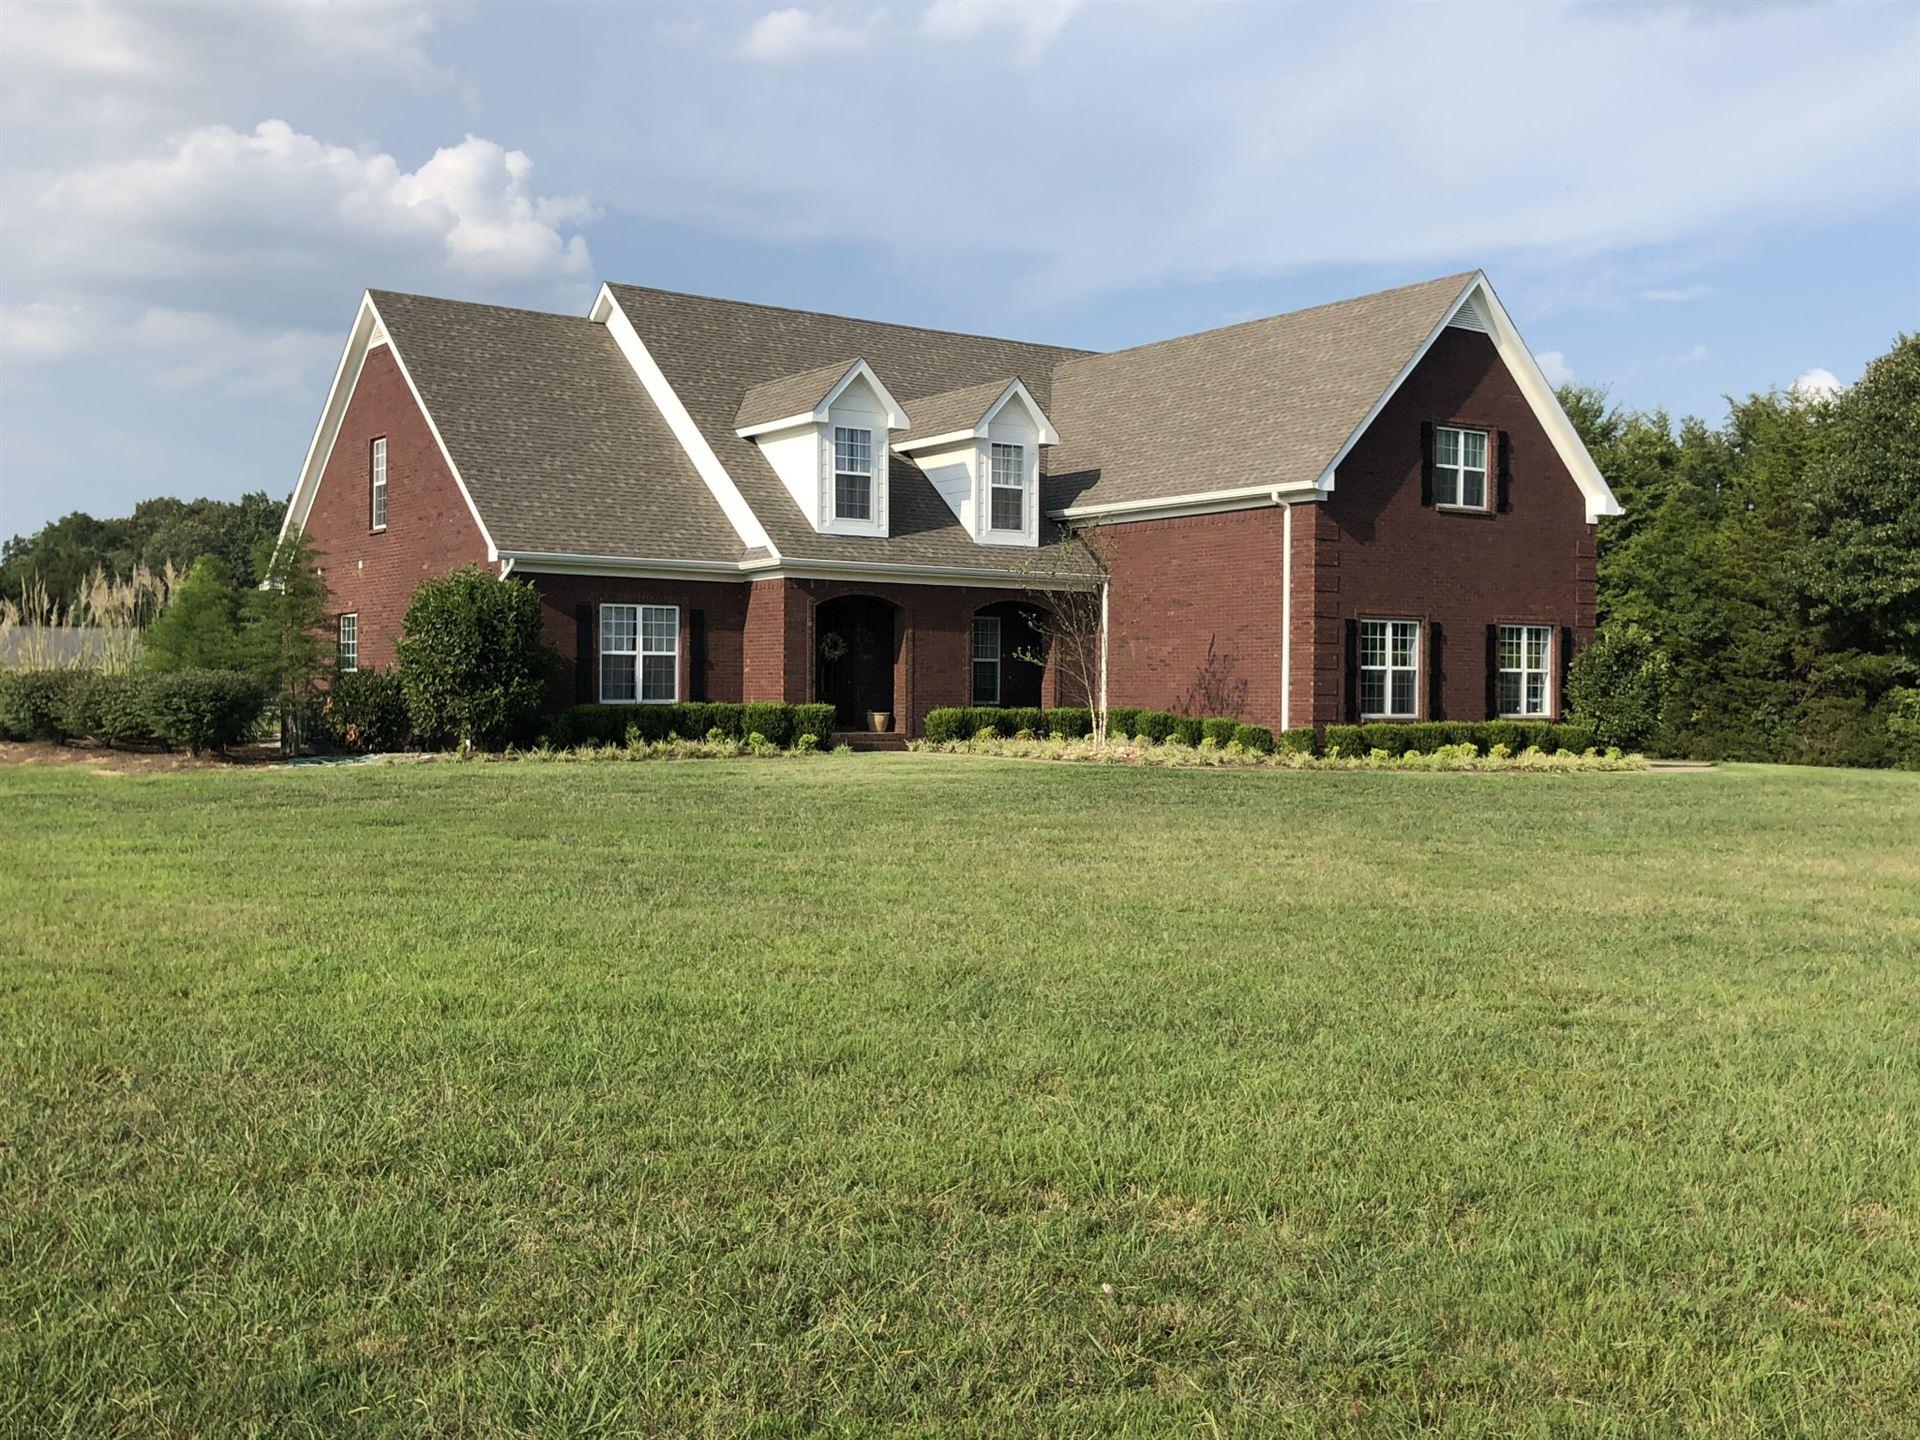 214 Steelson Way, Murfreesboro, TN 37128 - MLS#: 2183298